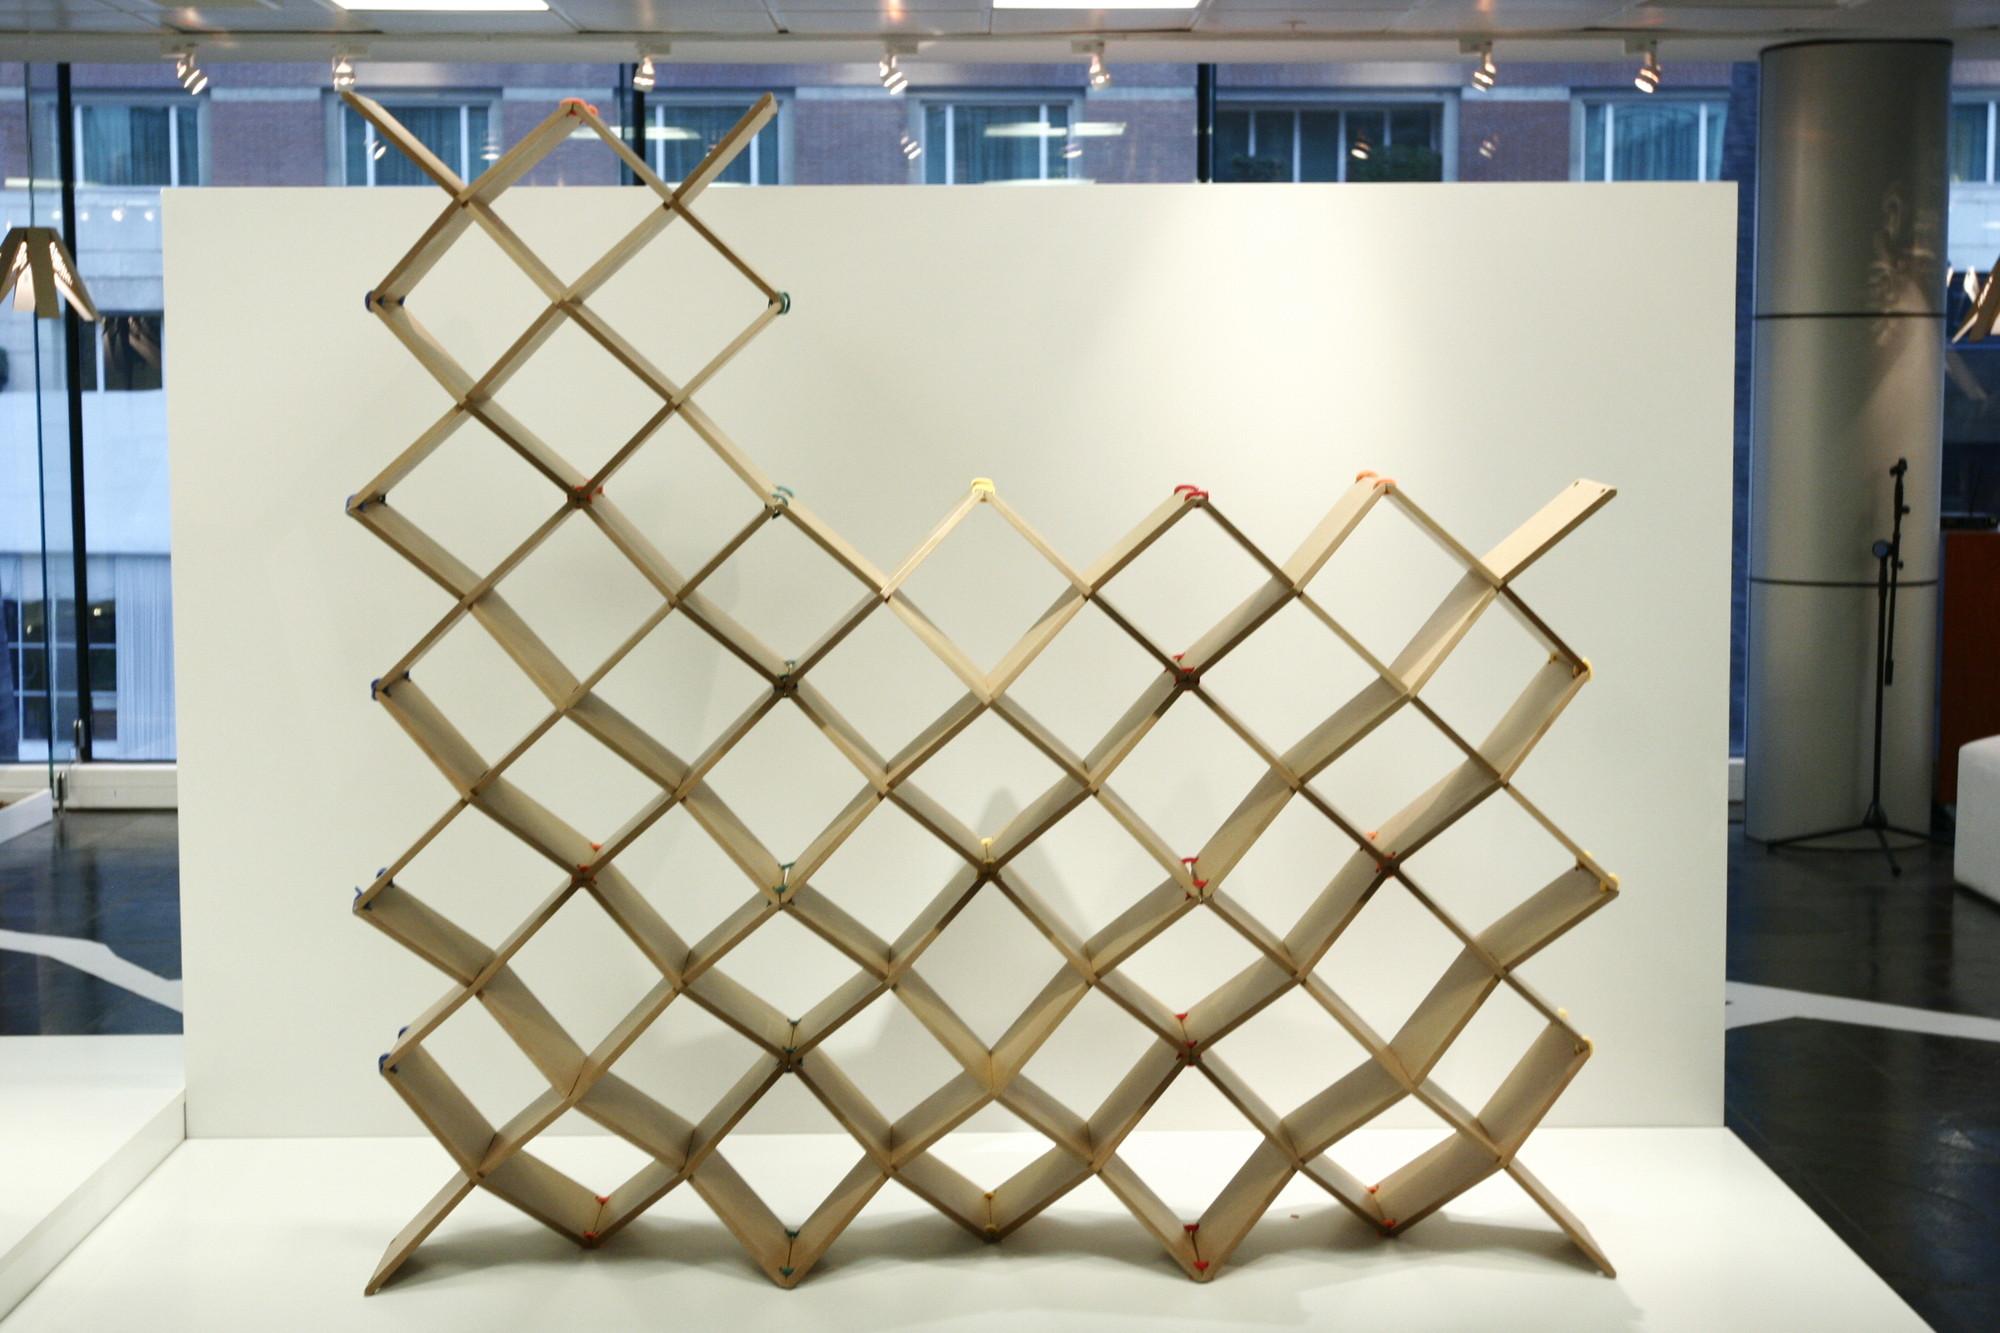 Mueble ganador Concurso 2010.Eme, Chile. Image Courtesy of MASISA